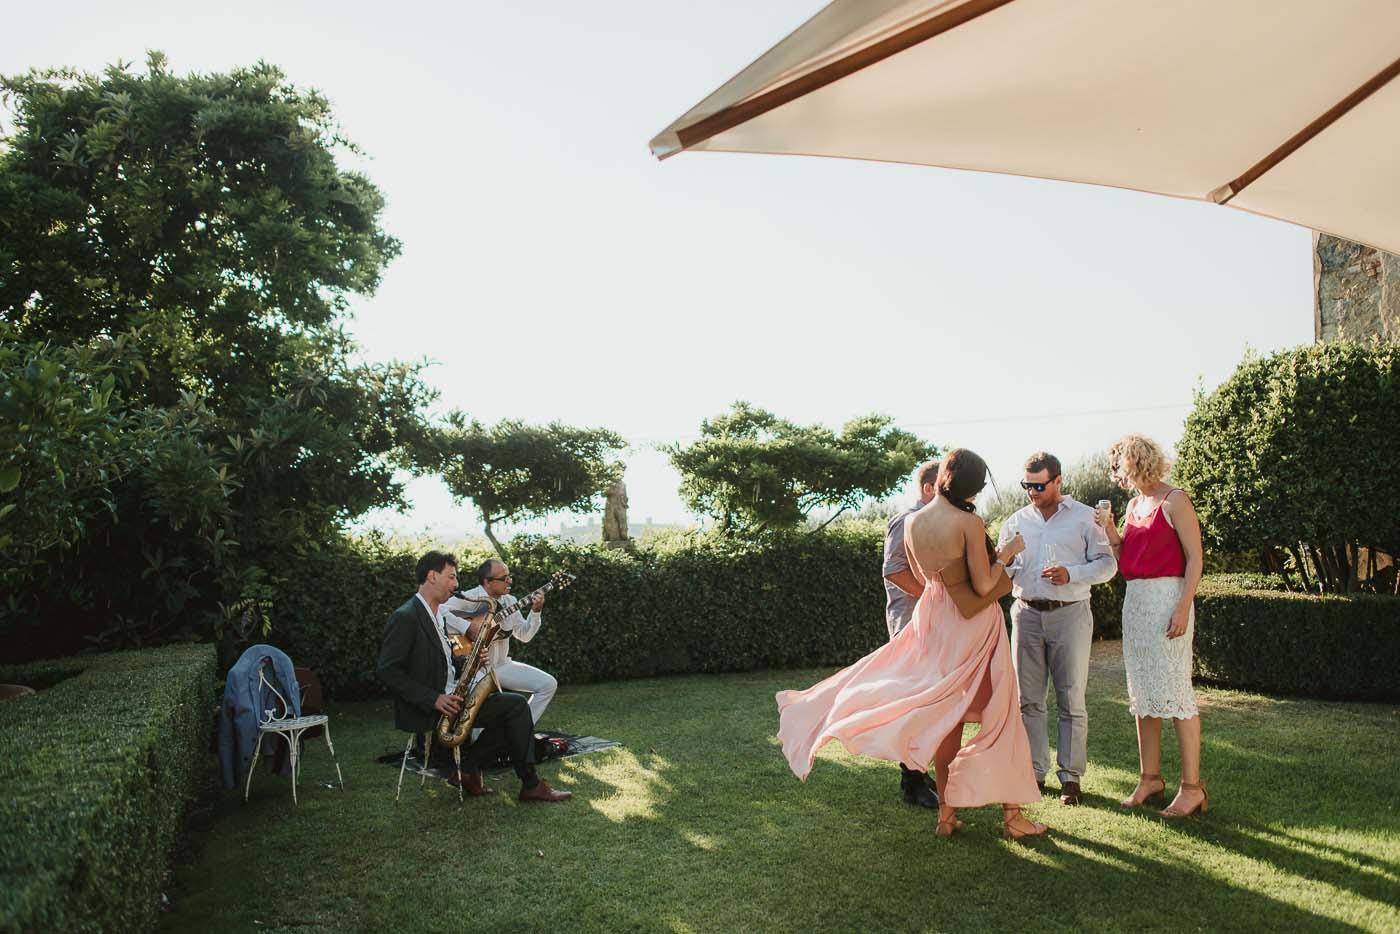 Relaxed-wedding-borgo-stomennano-1136